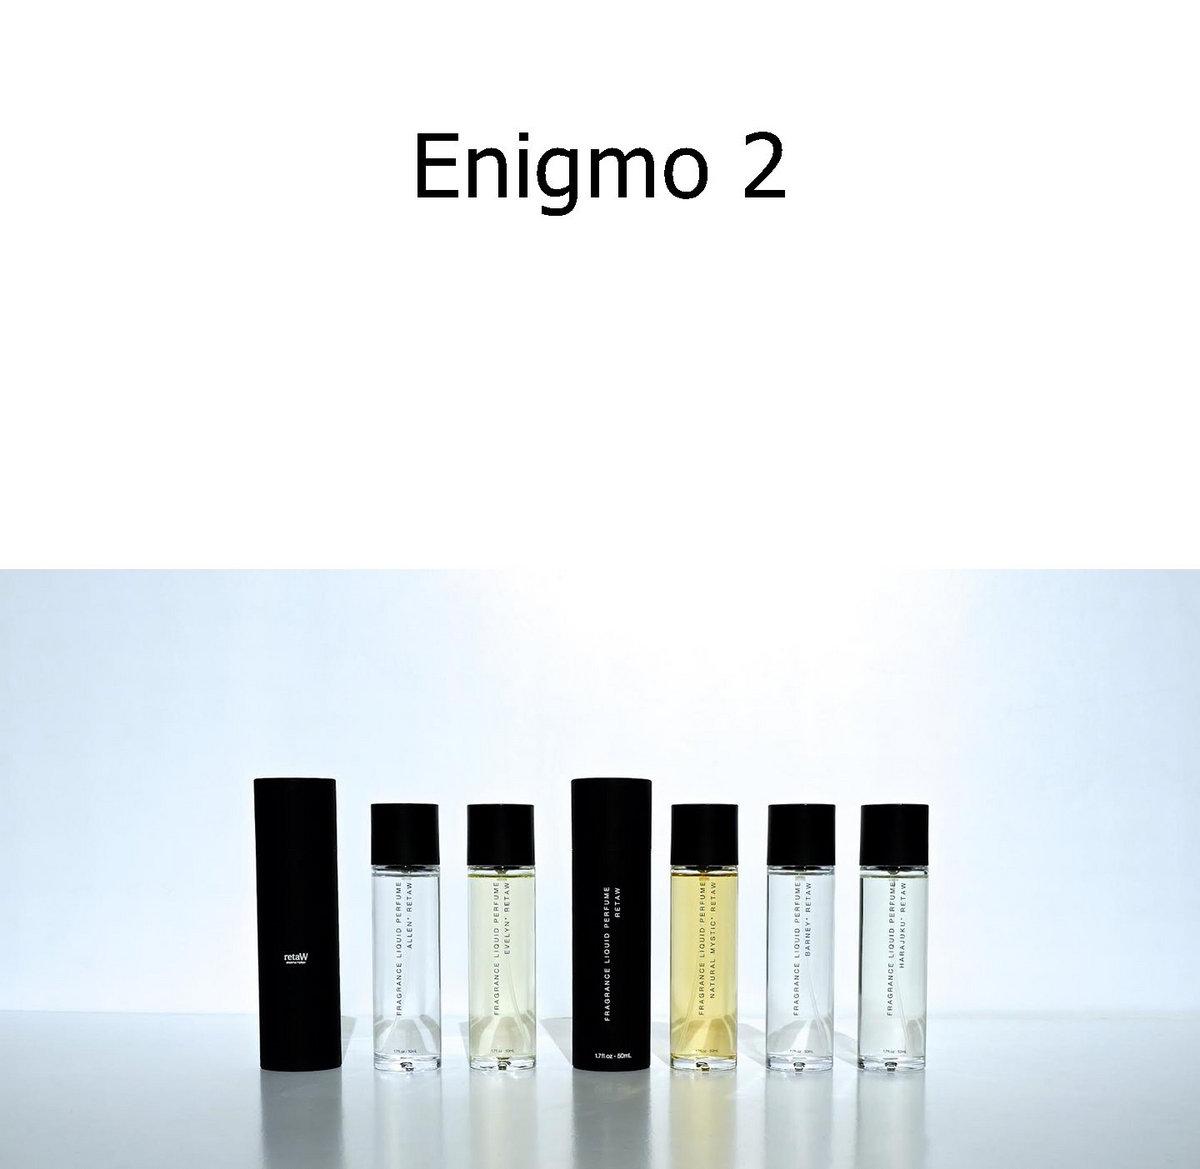 ENIGMO 2 V 1 2 where download to Mac | testilarrgilchtab